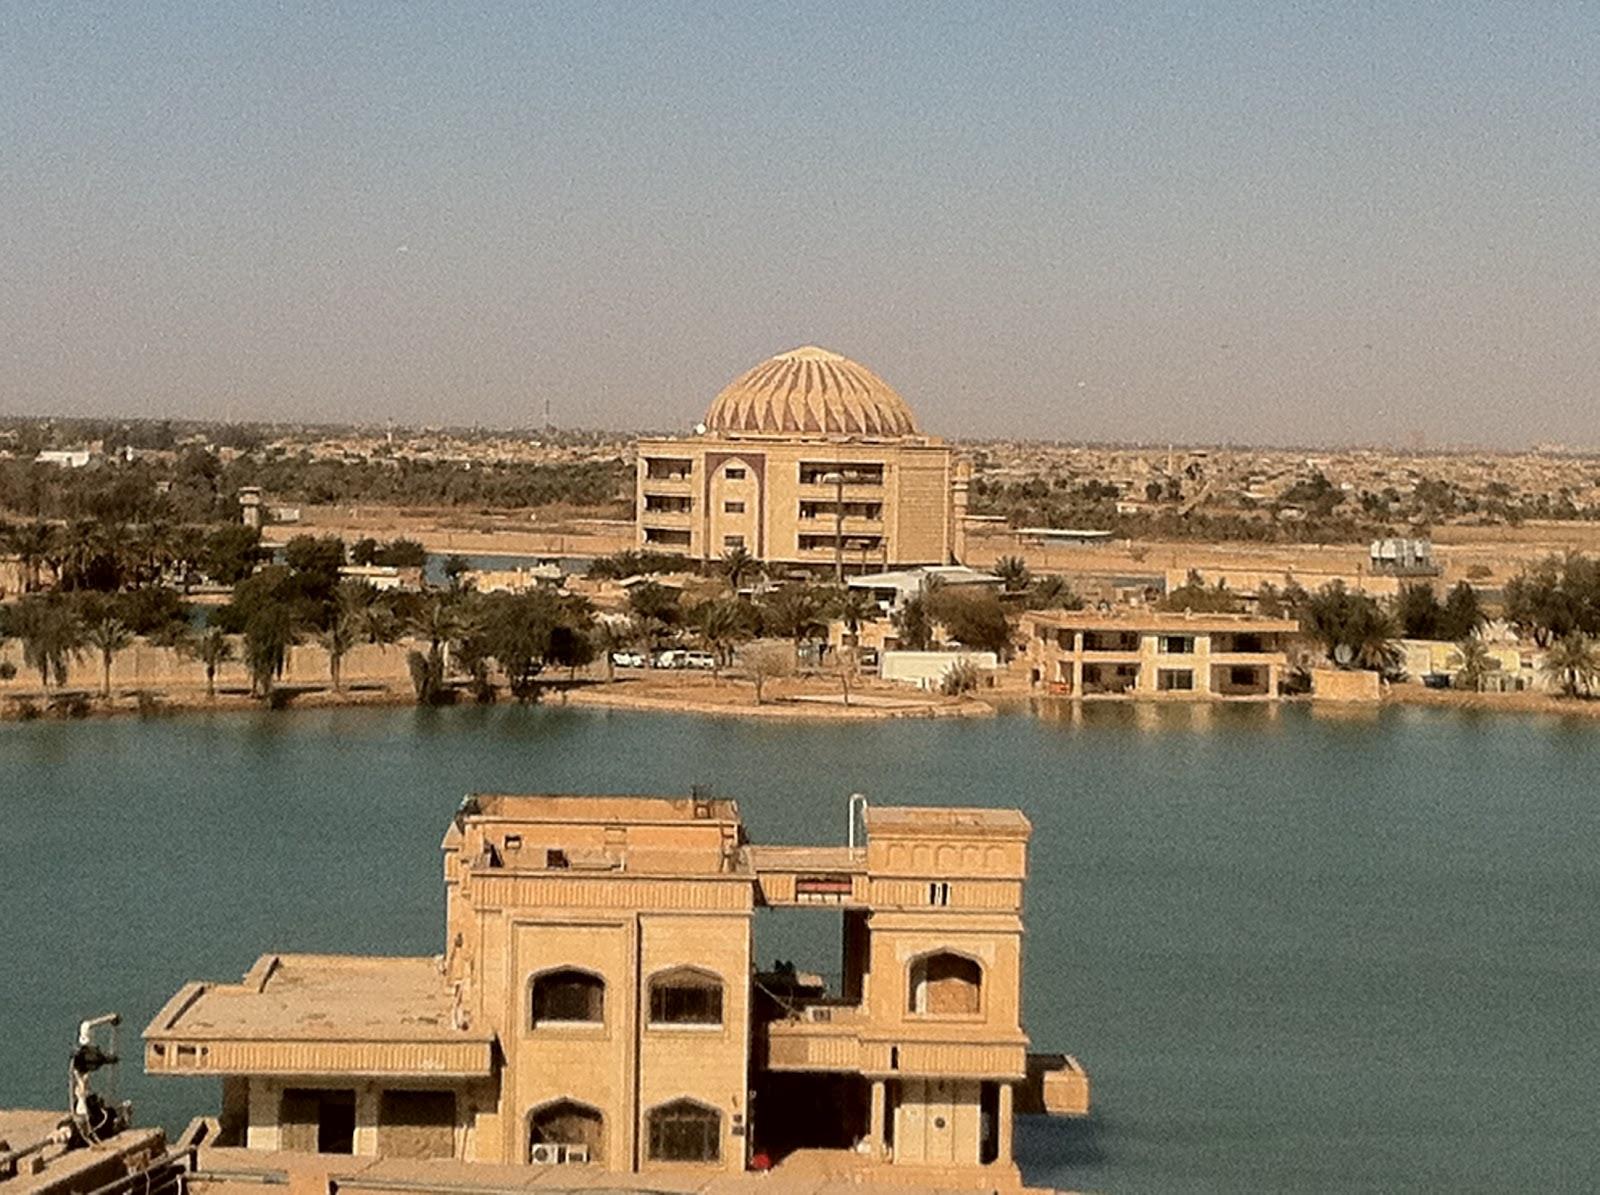 victory baghdad palace iran base america jbb into